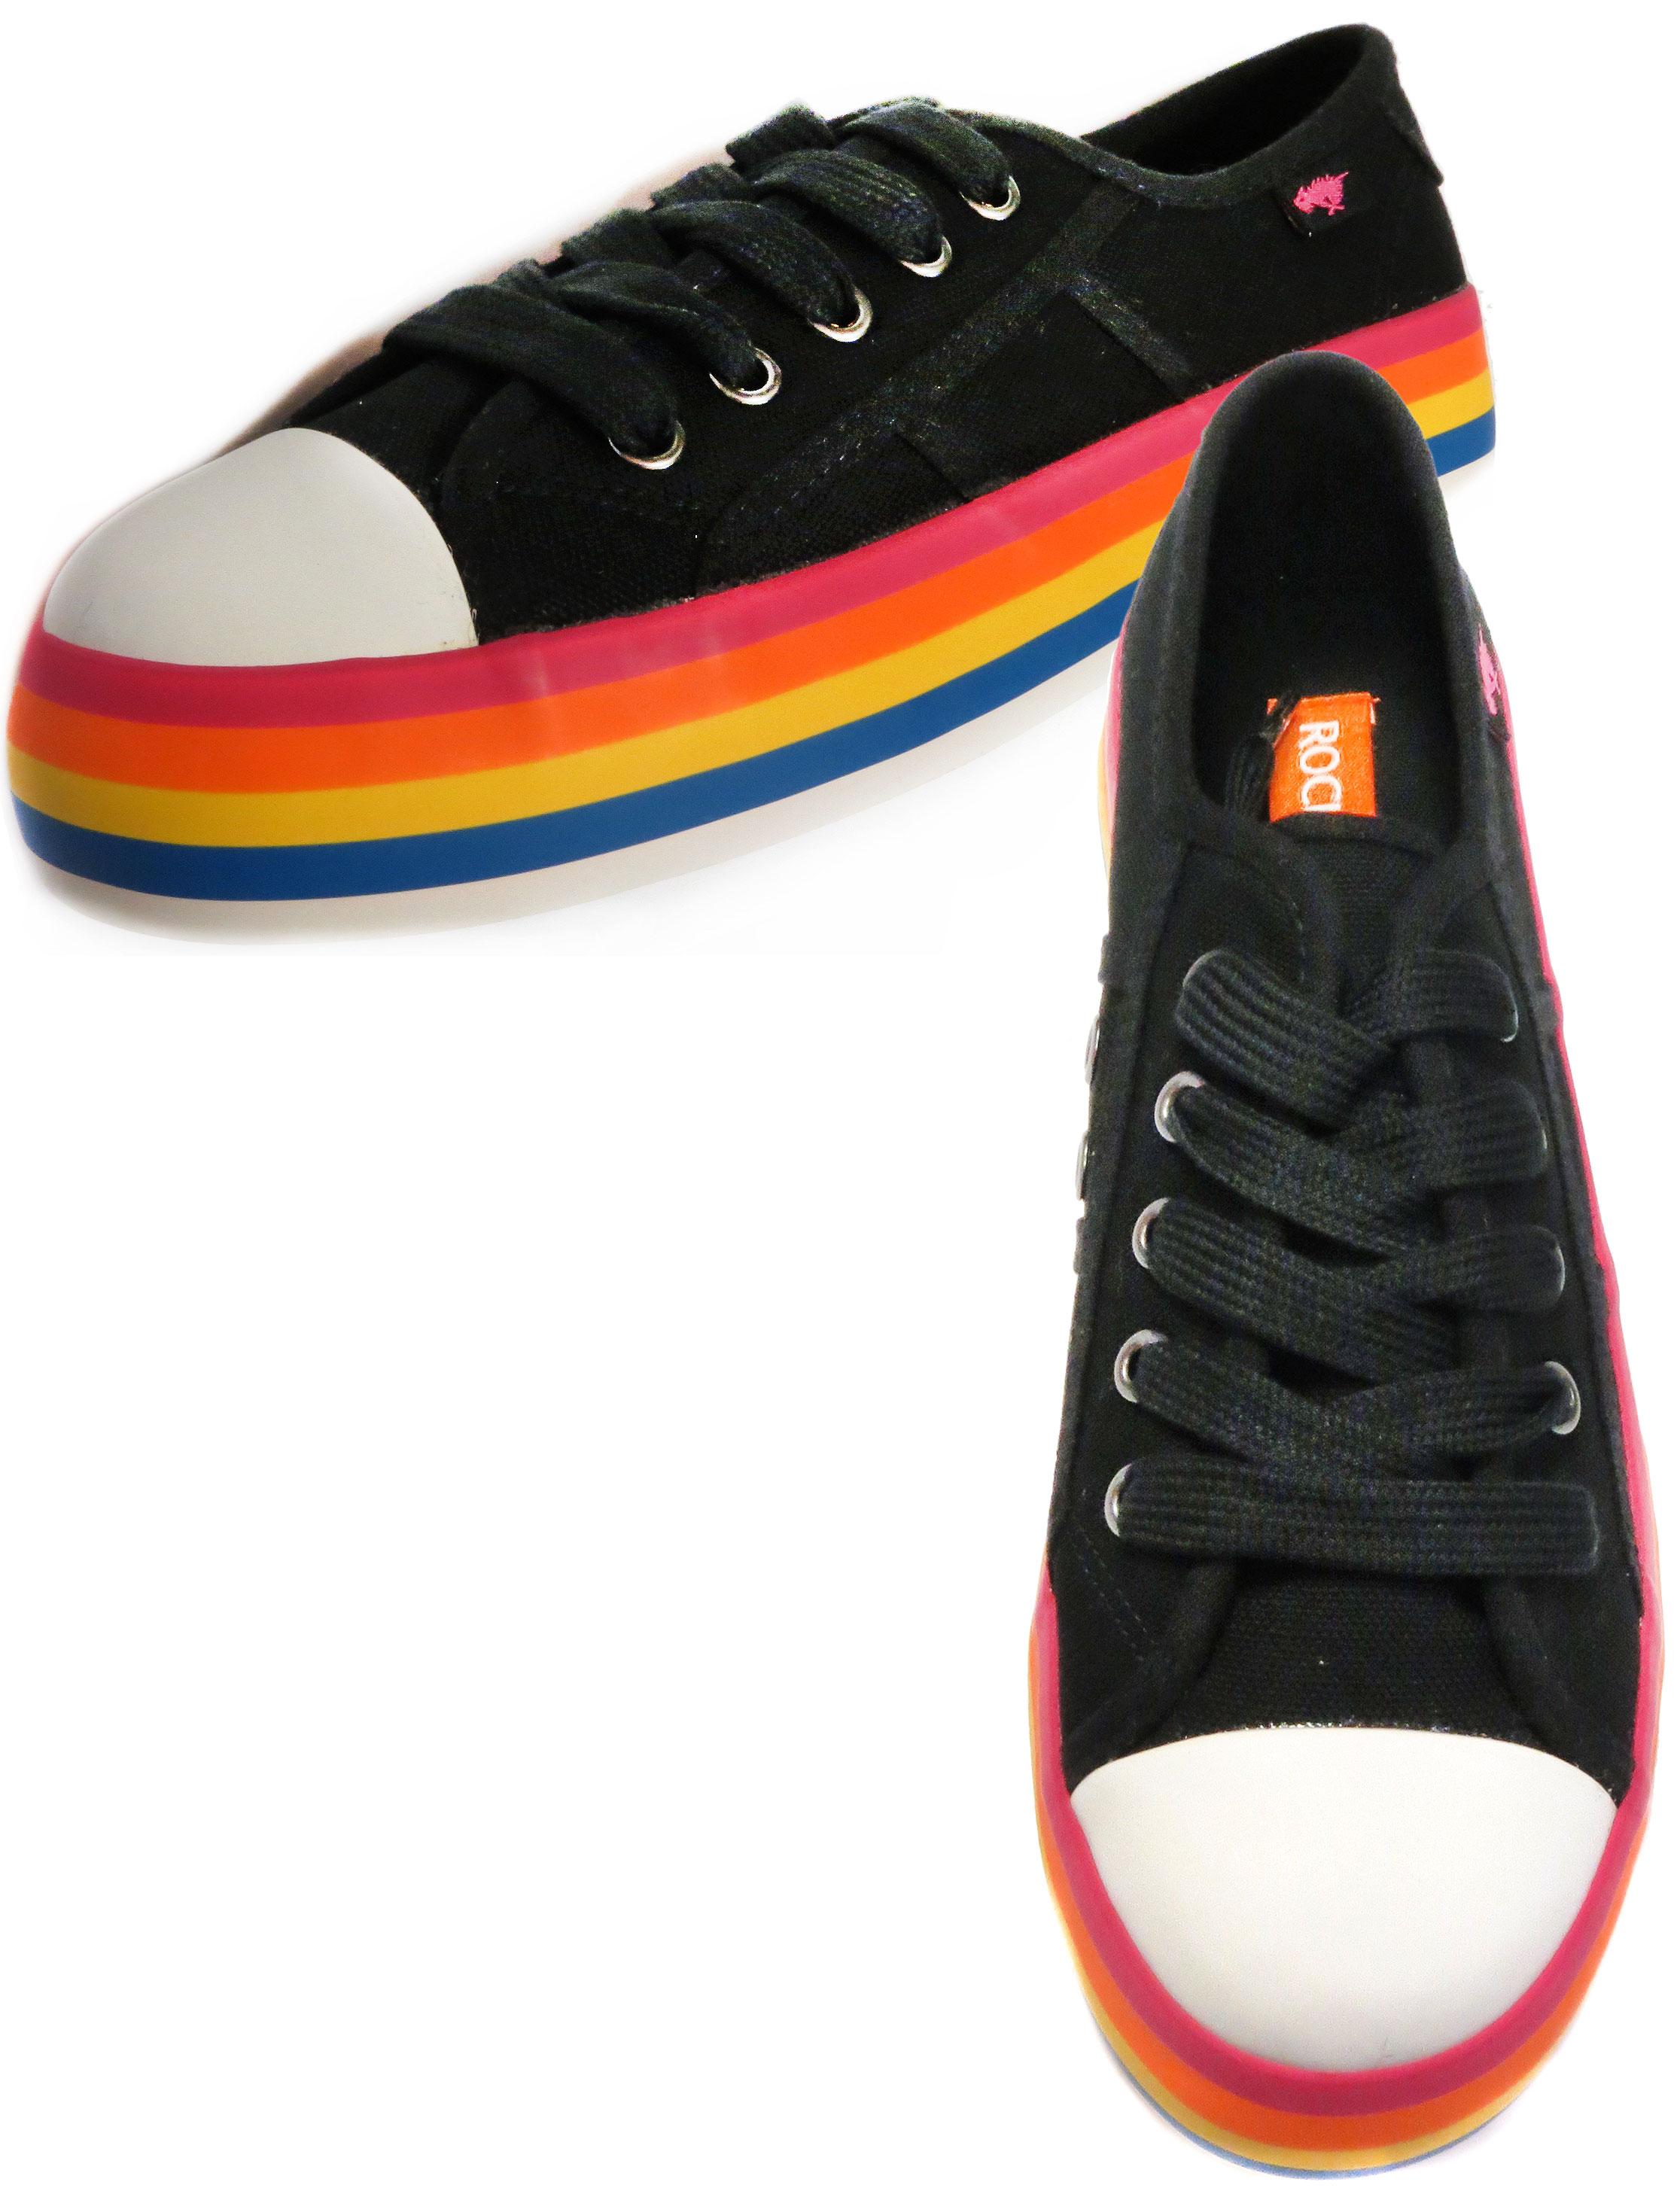 Rainbow Sneaks